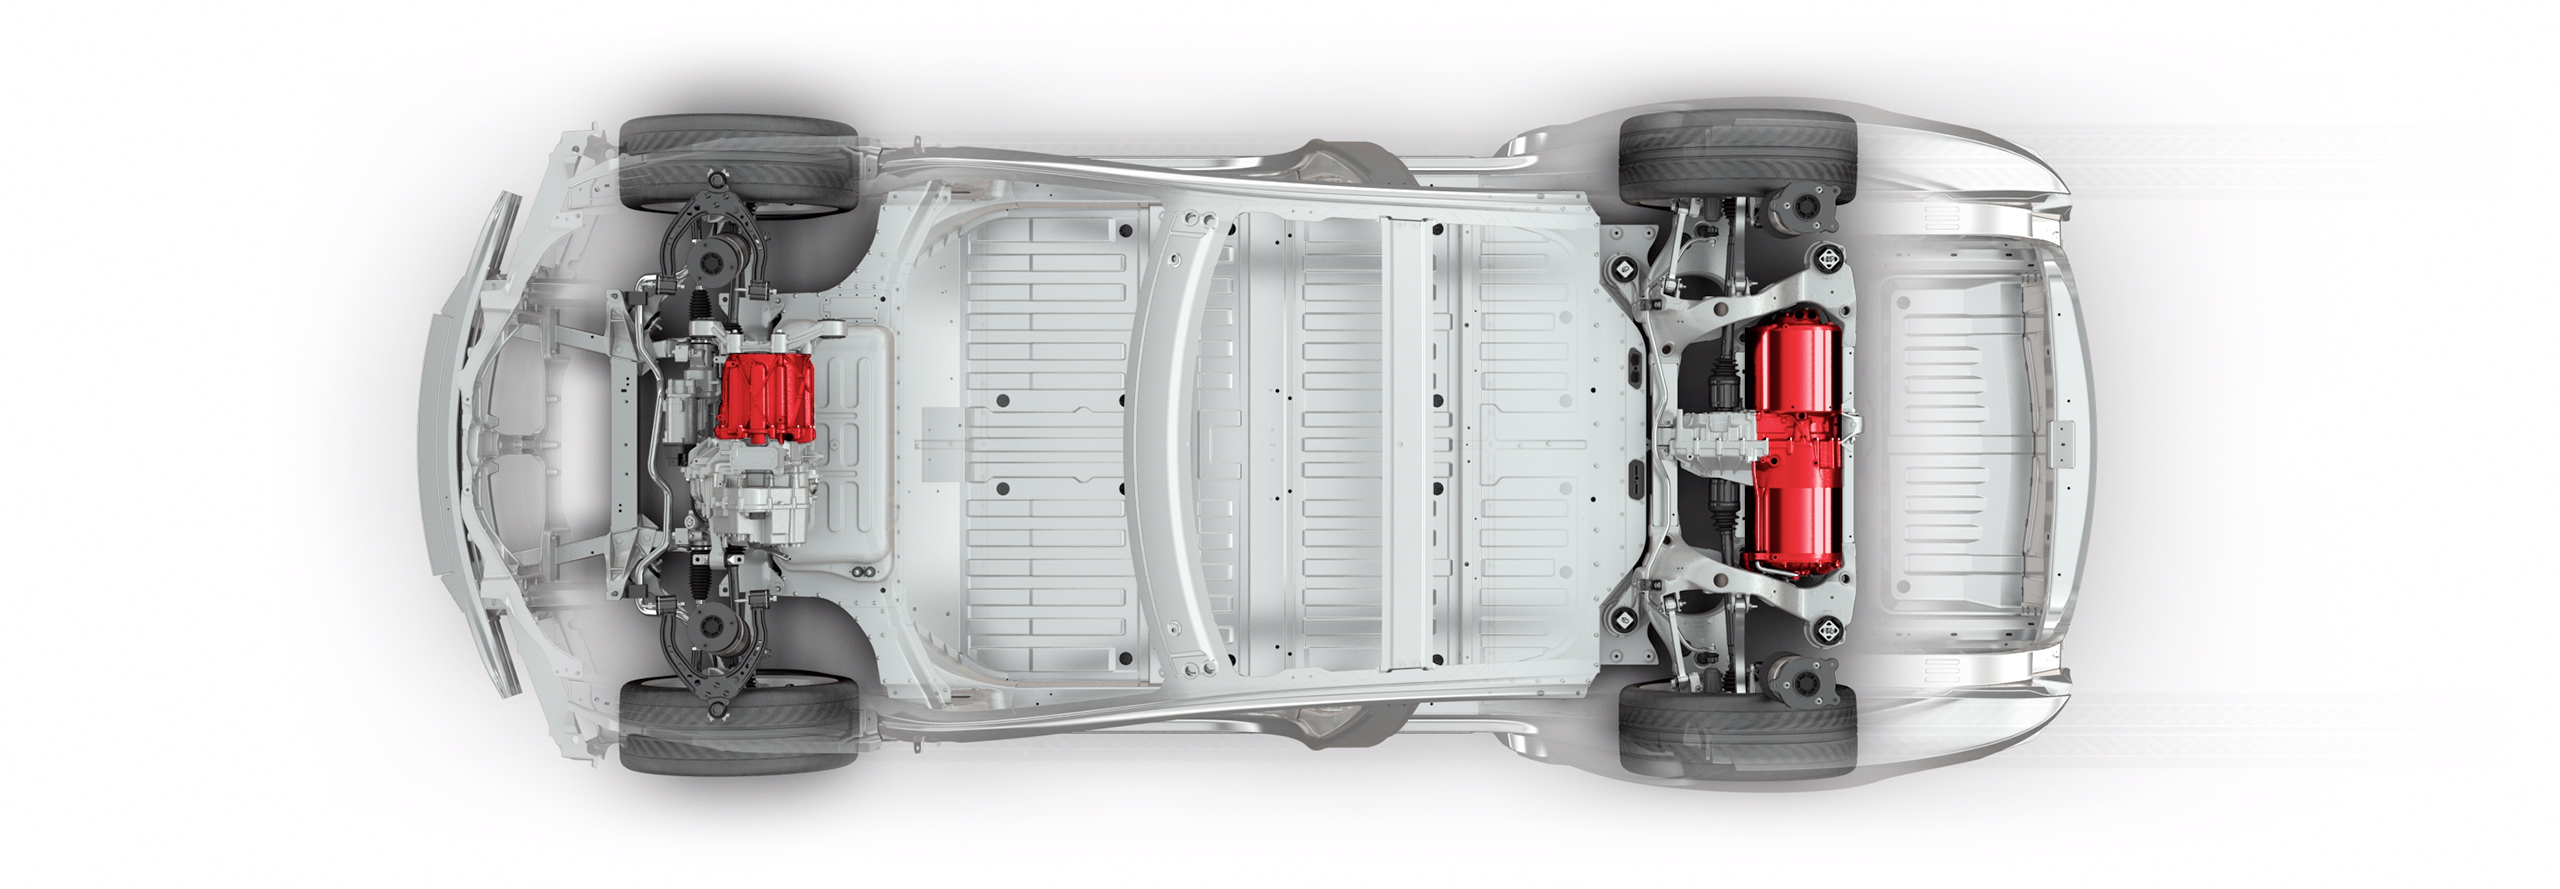 7_chassis-motor-p85d.jpg